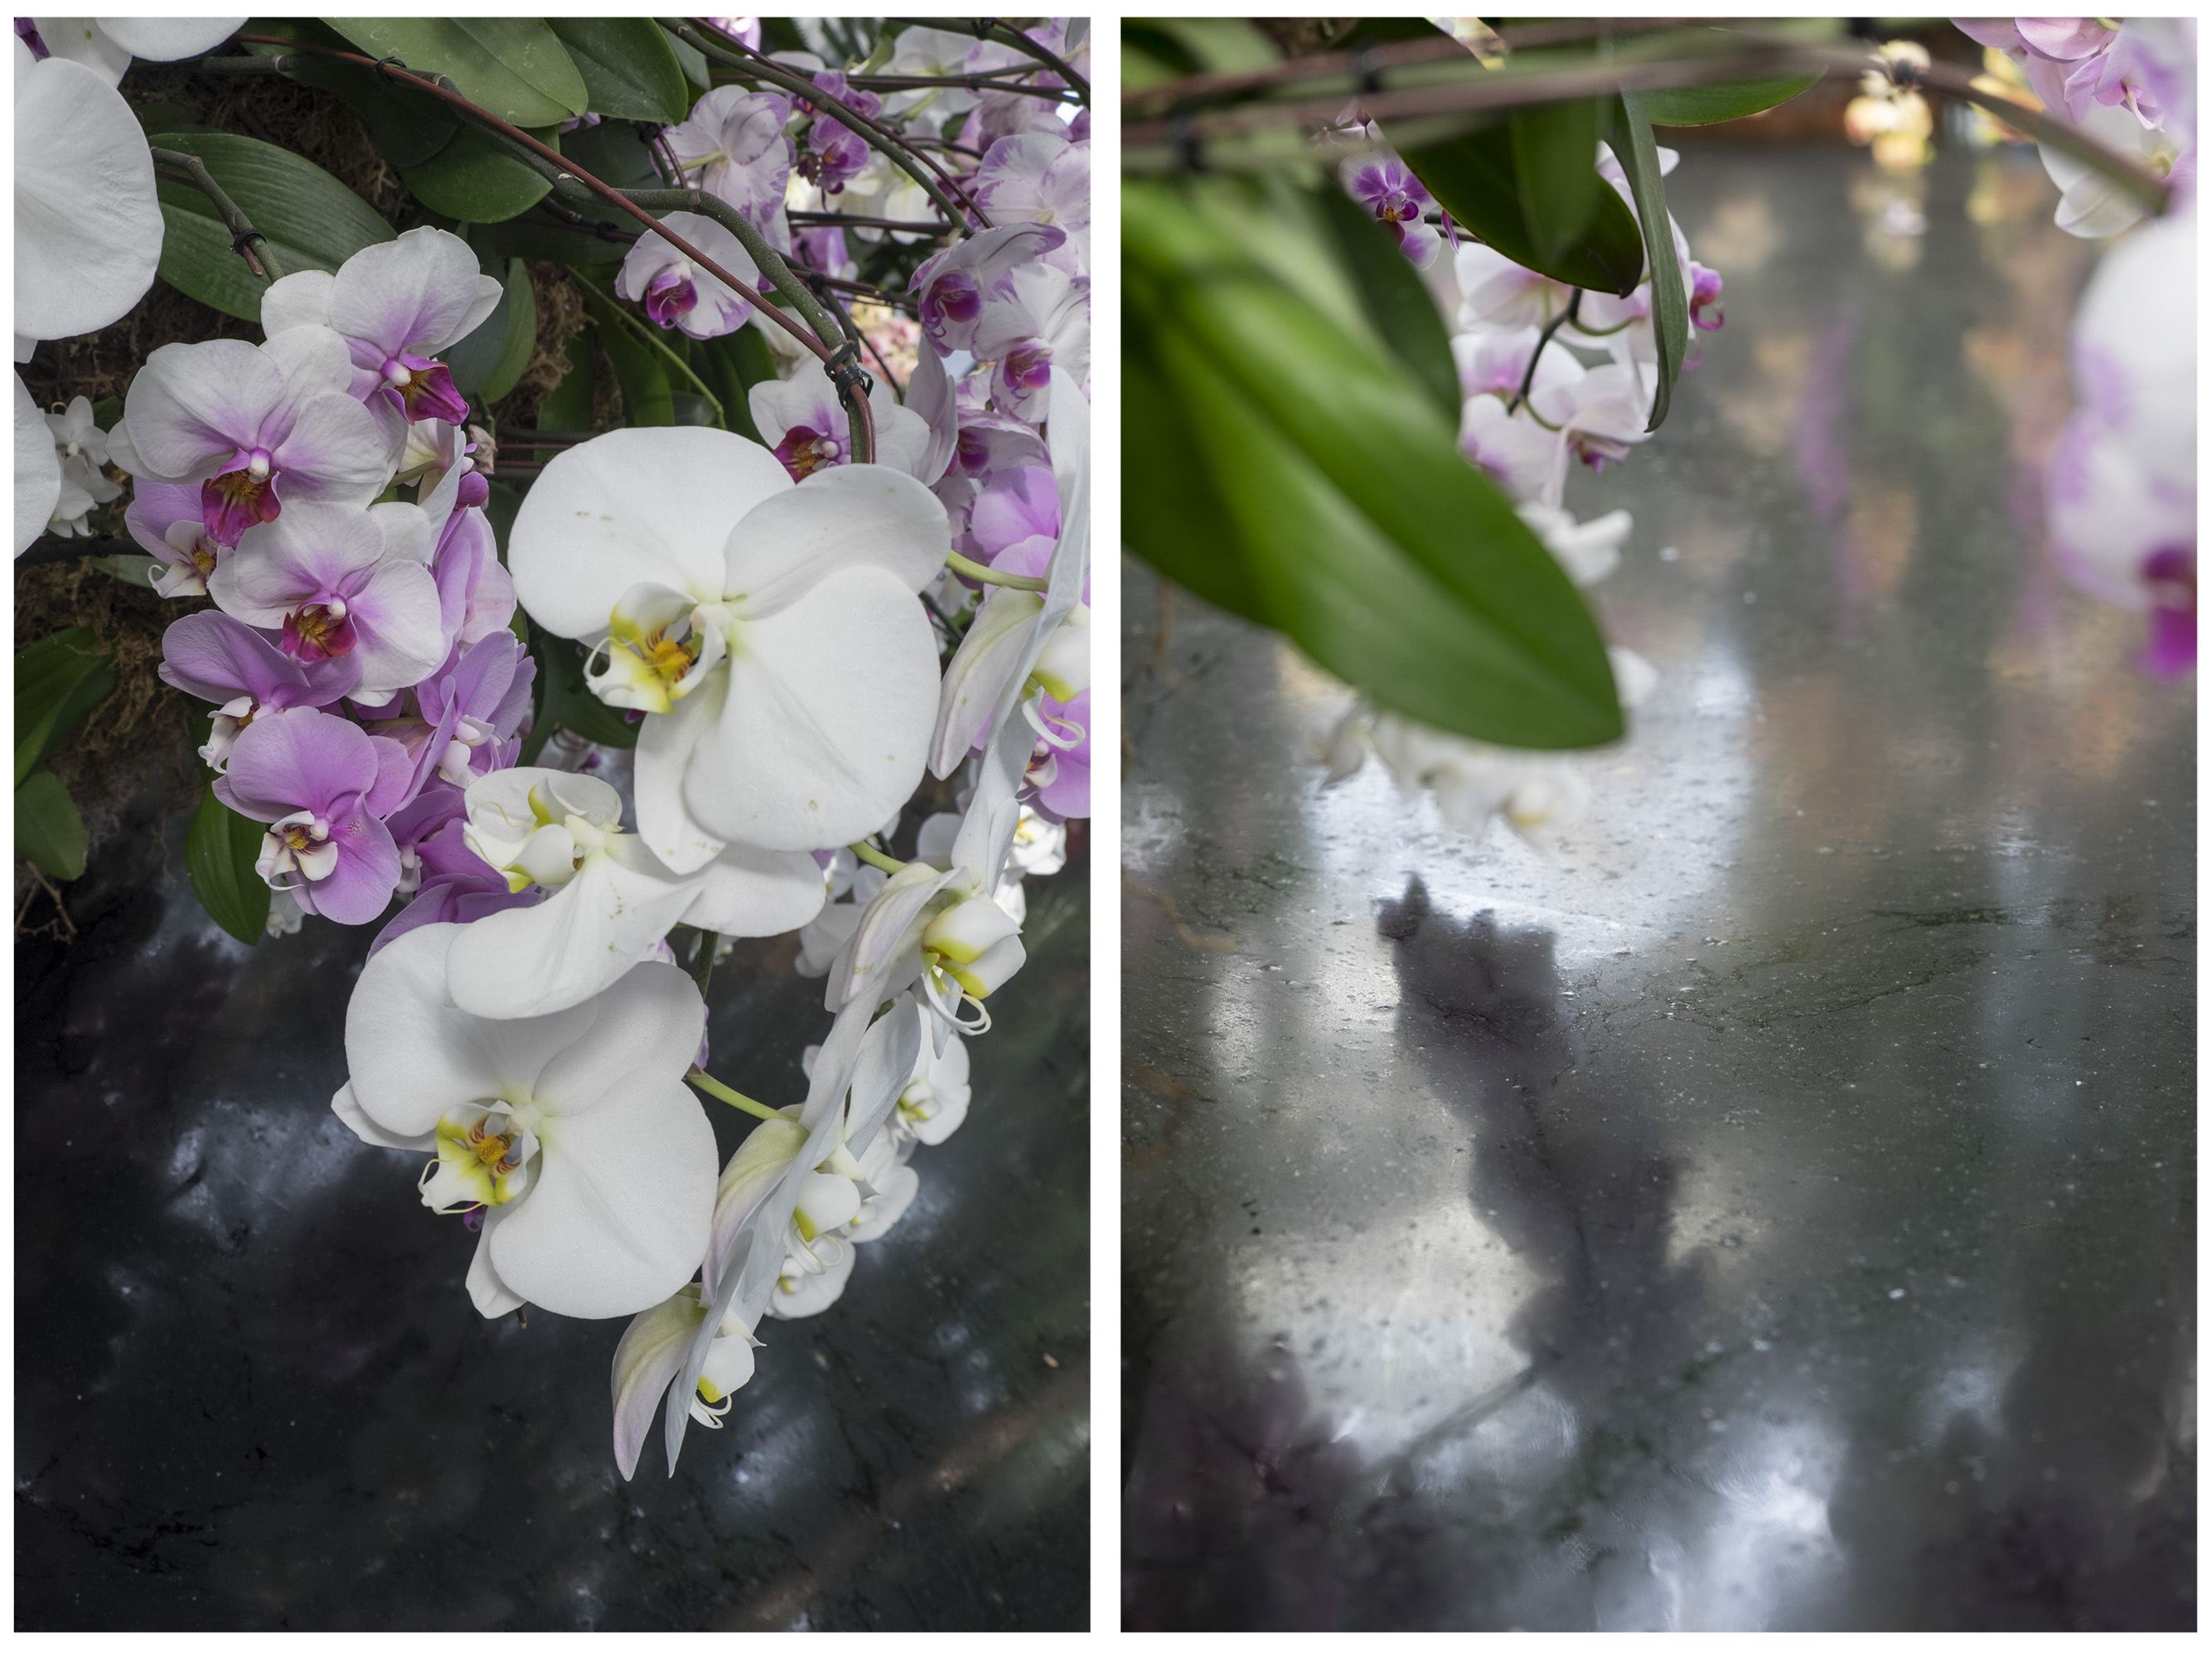 Orchid I, 2015 (Binary Rivalry)